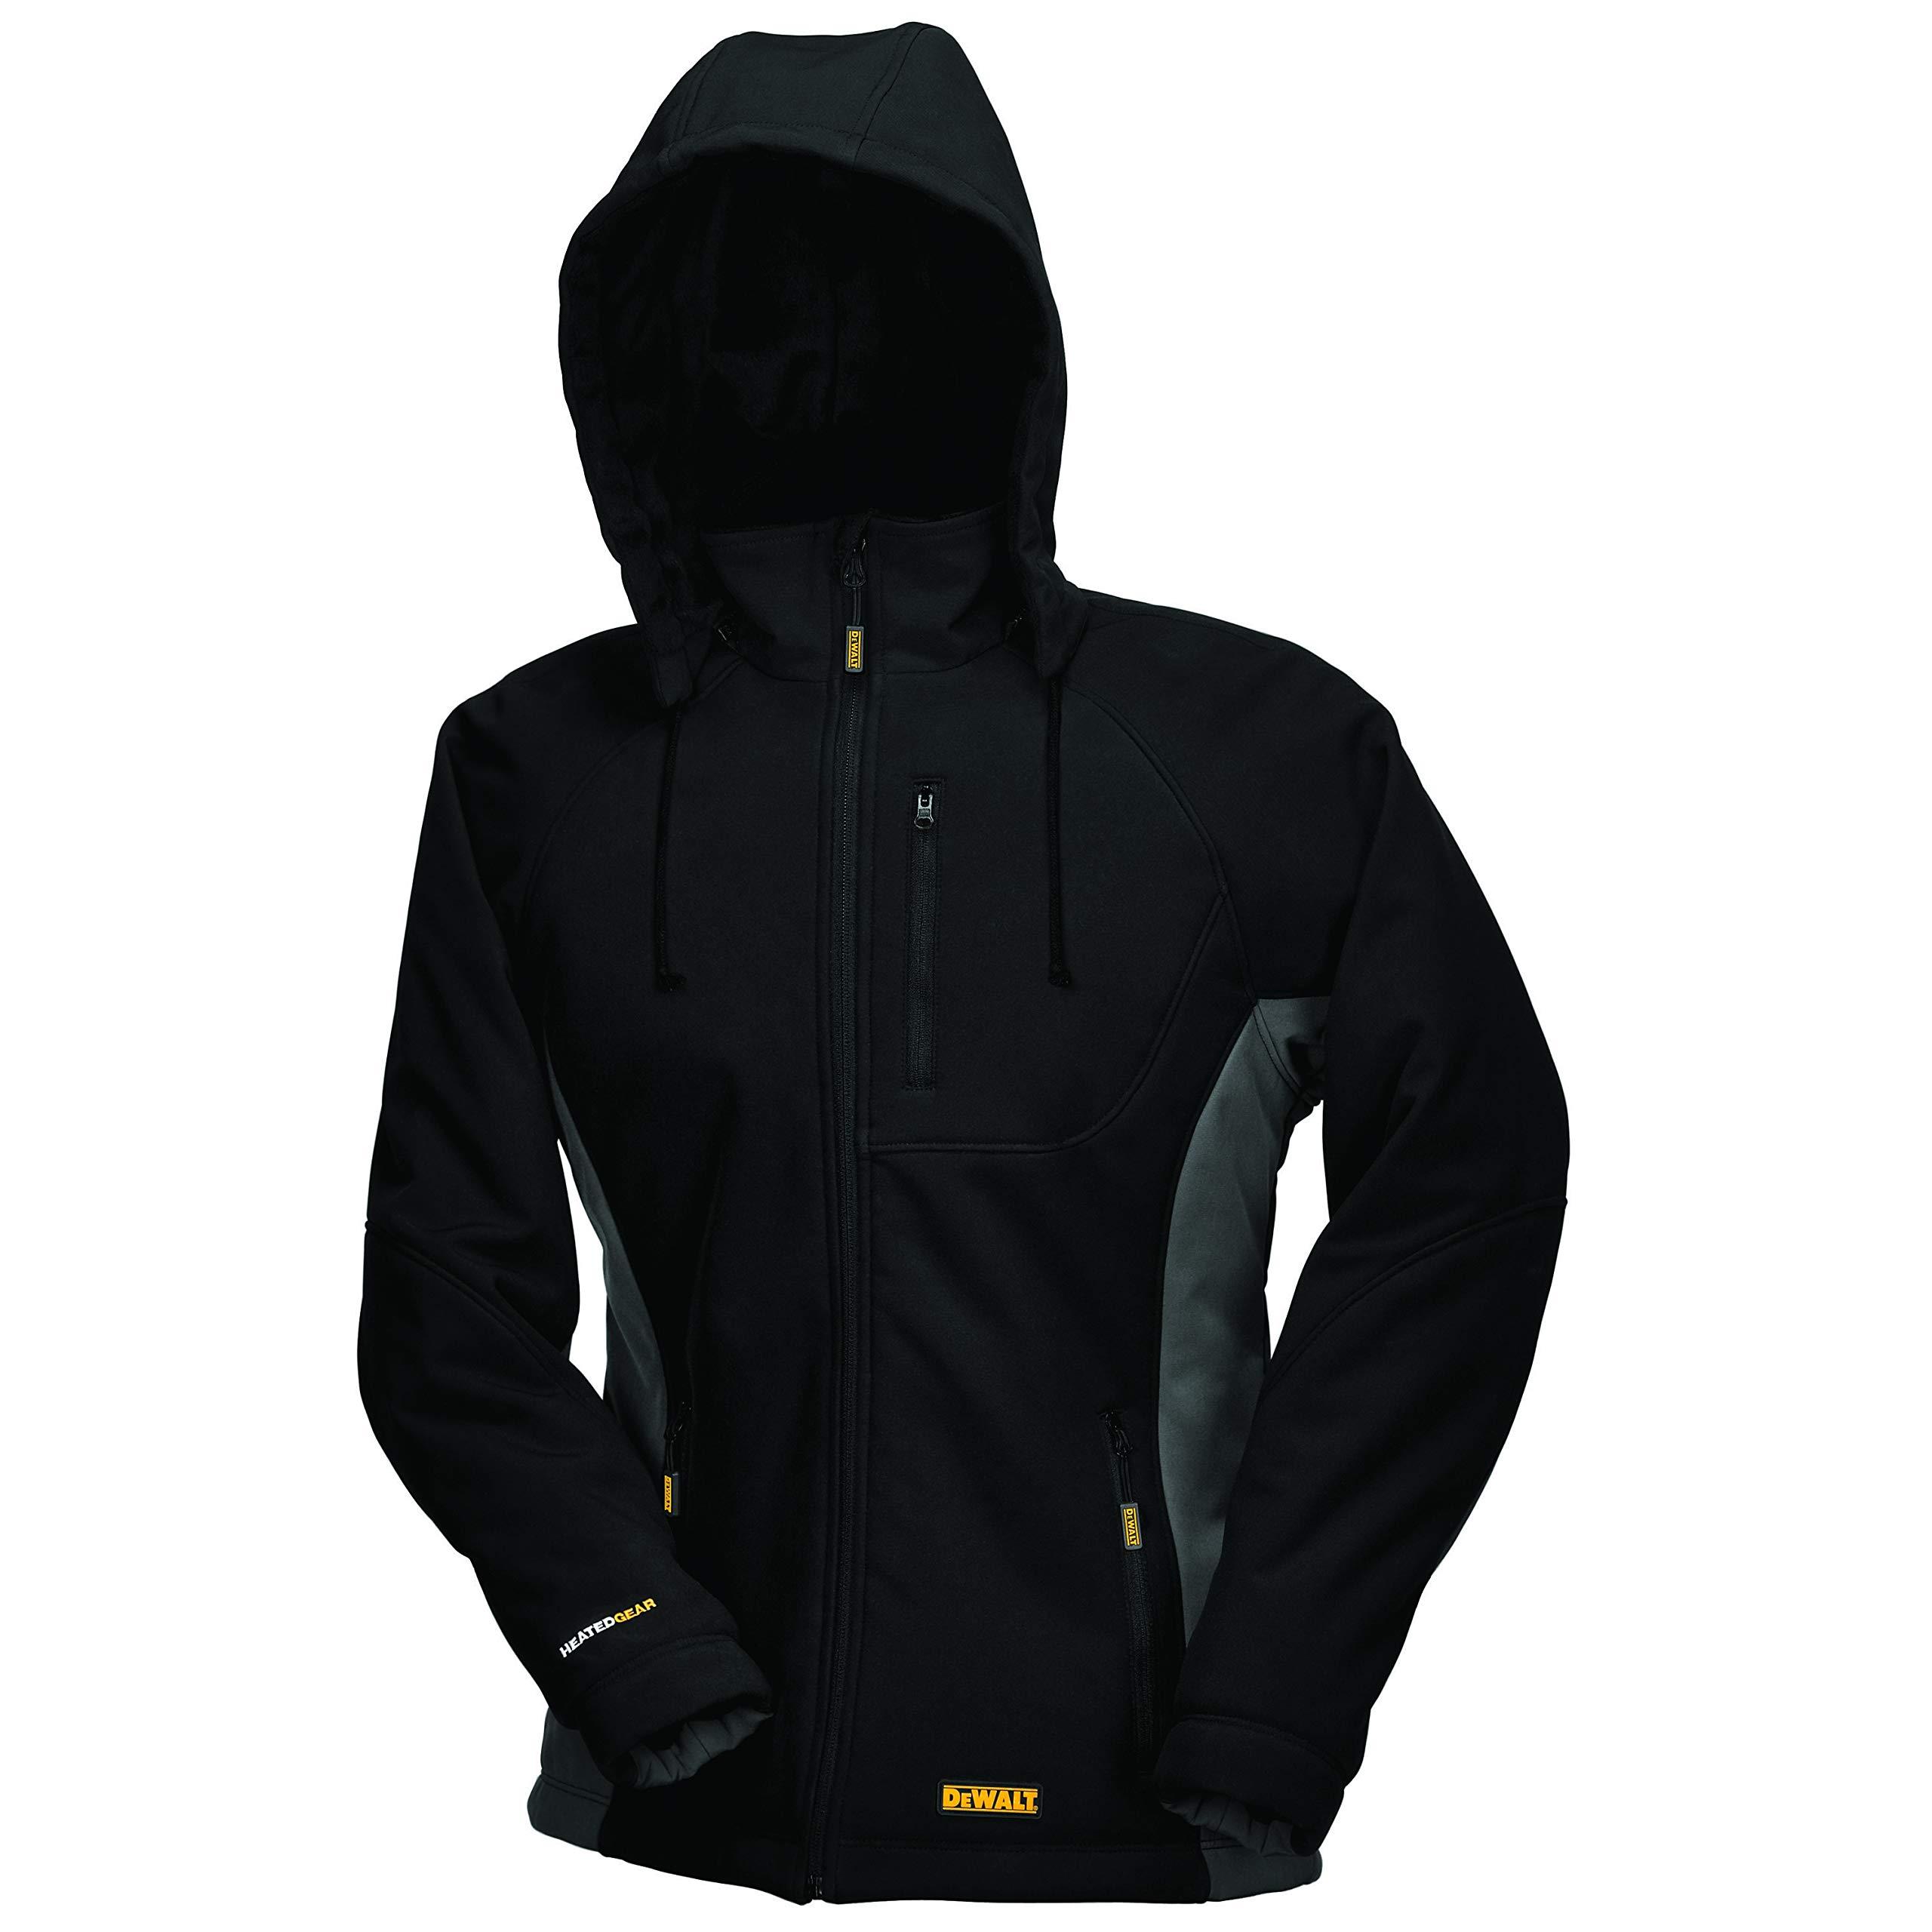 DEWALT DCHJ066C1-M 20V/12V MAX Women's Heated Jacket Kit, Black, Medium by DEWALT